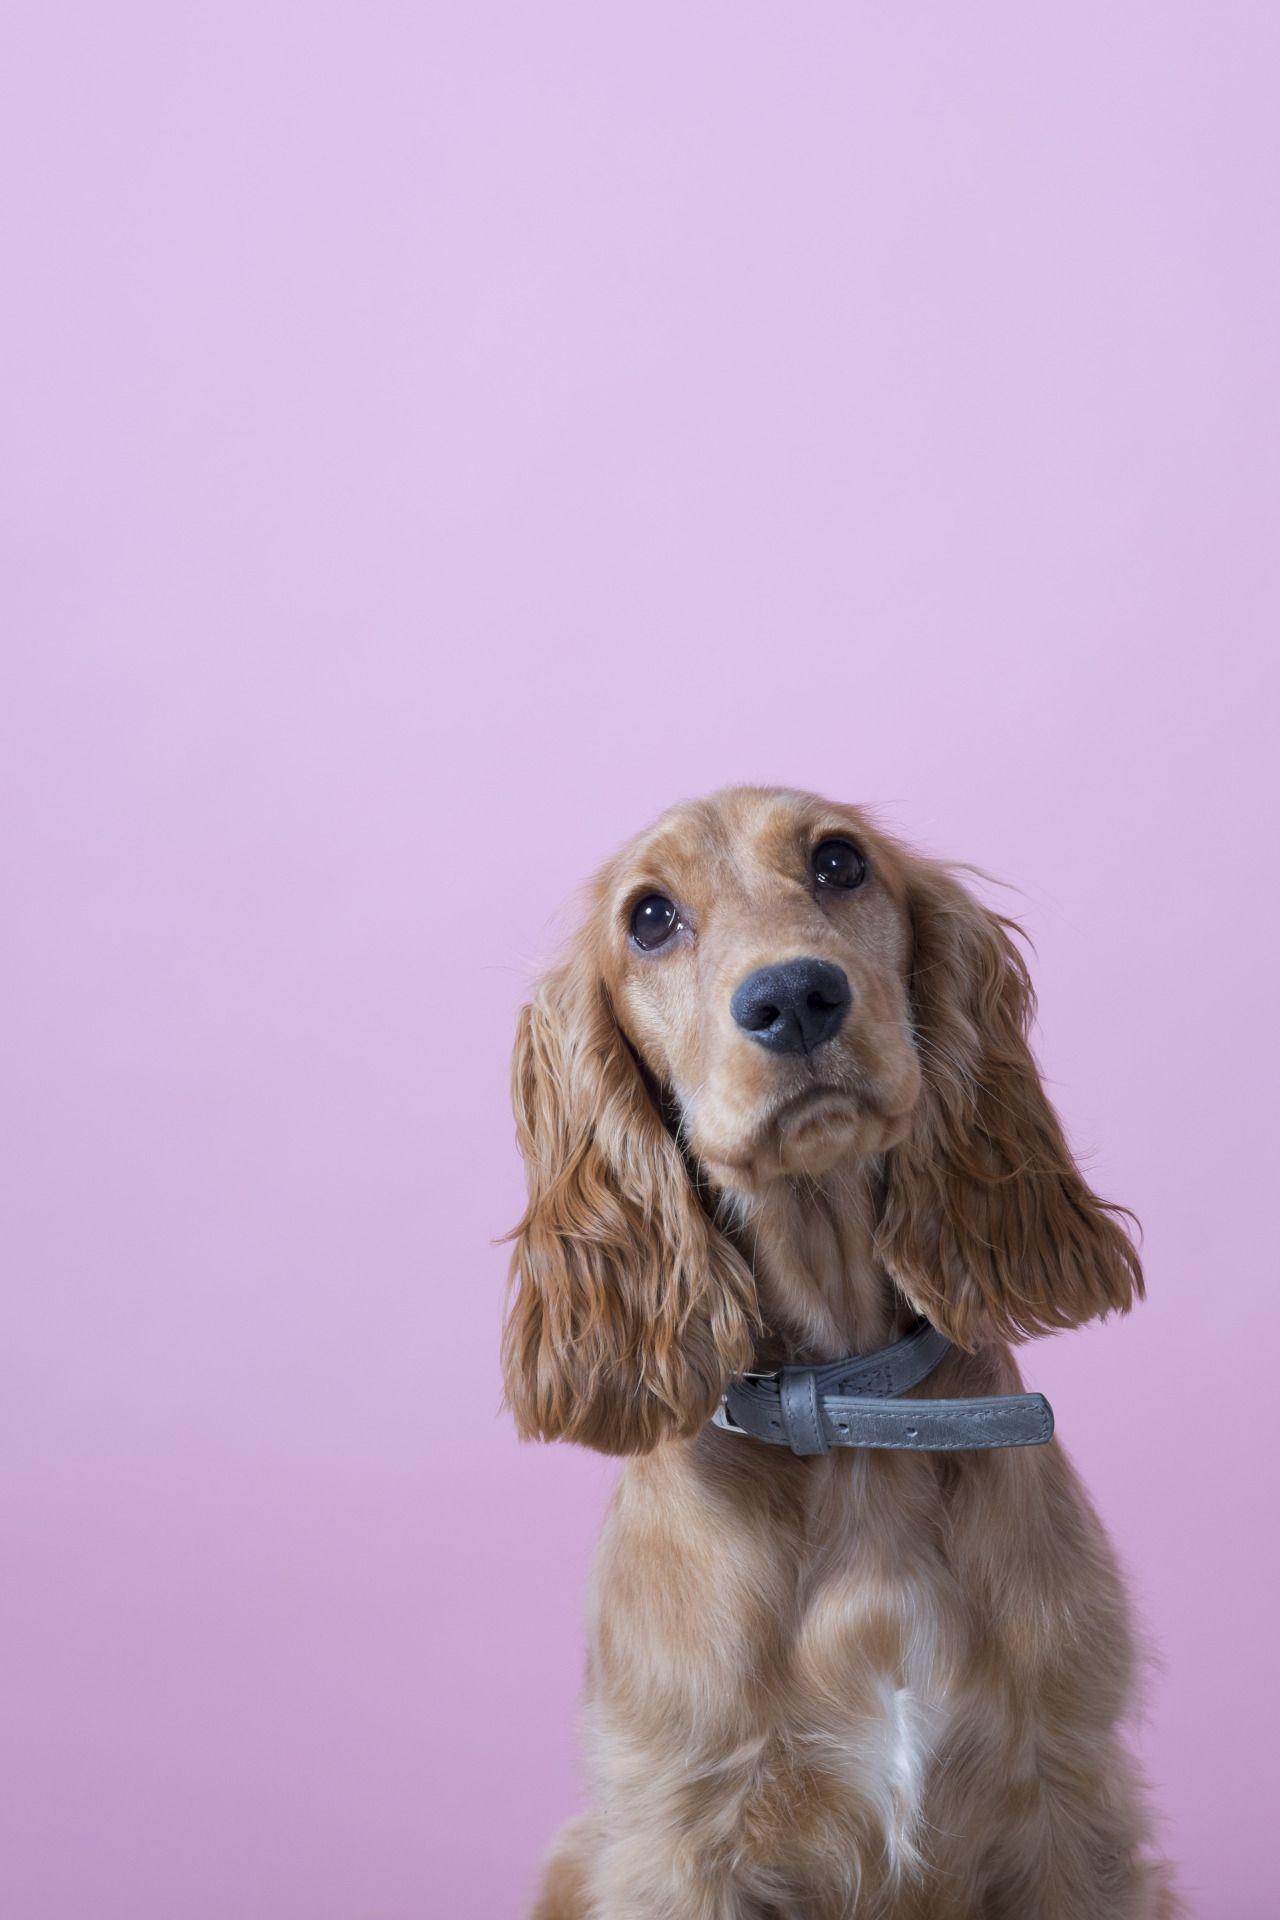 Weihnachtsbilder Hunde - Weihnachtsbilder Hunde